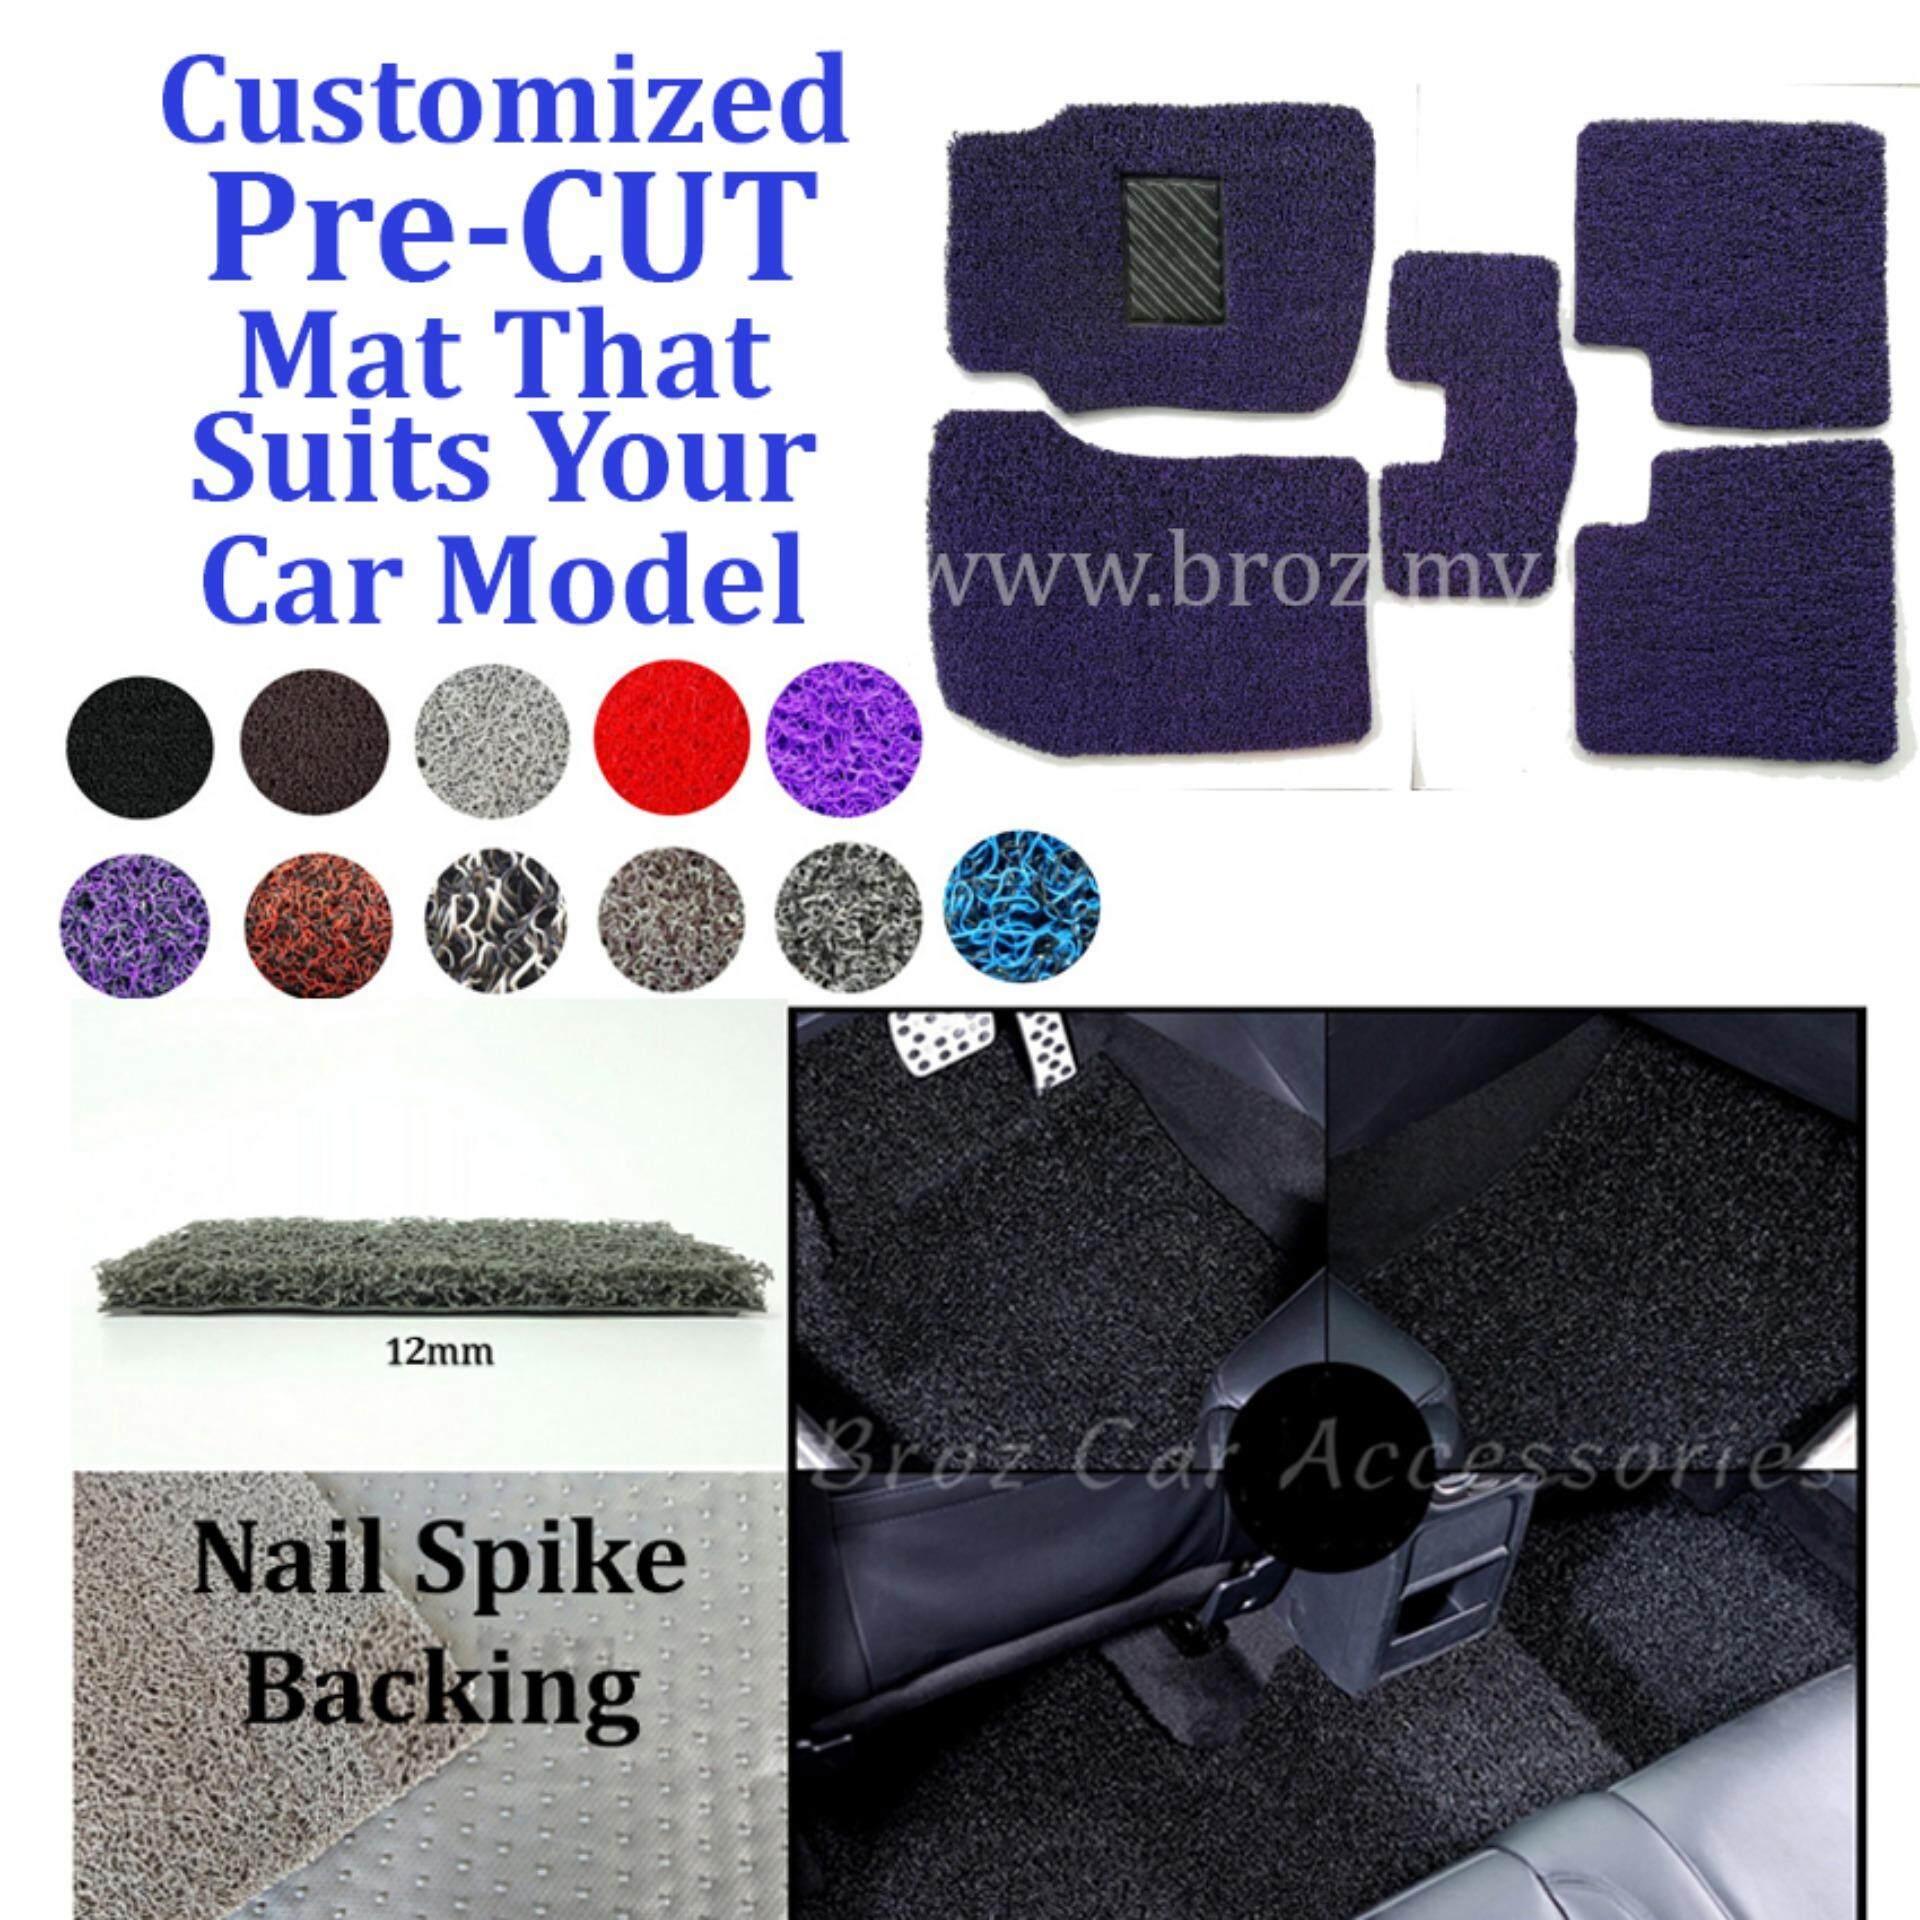 Broz Mercedes E-200 12MM Customized PRE CUT PVC Coil Floor Mat with Driver Rubber Pad Anti Slip Carpet Nail Spike Backing - Purple Black